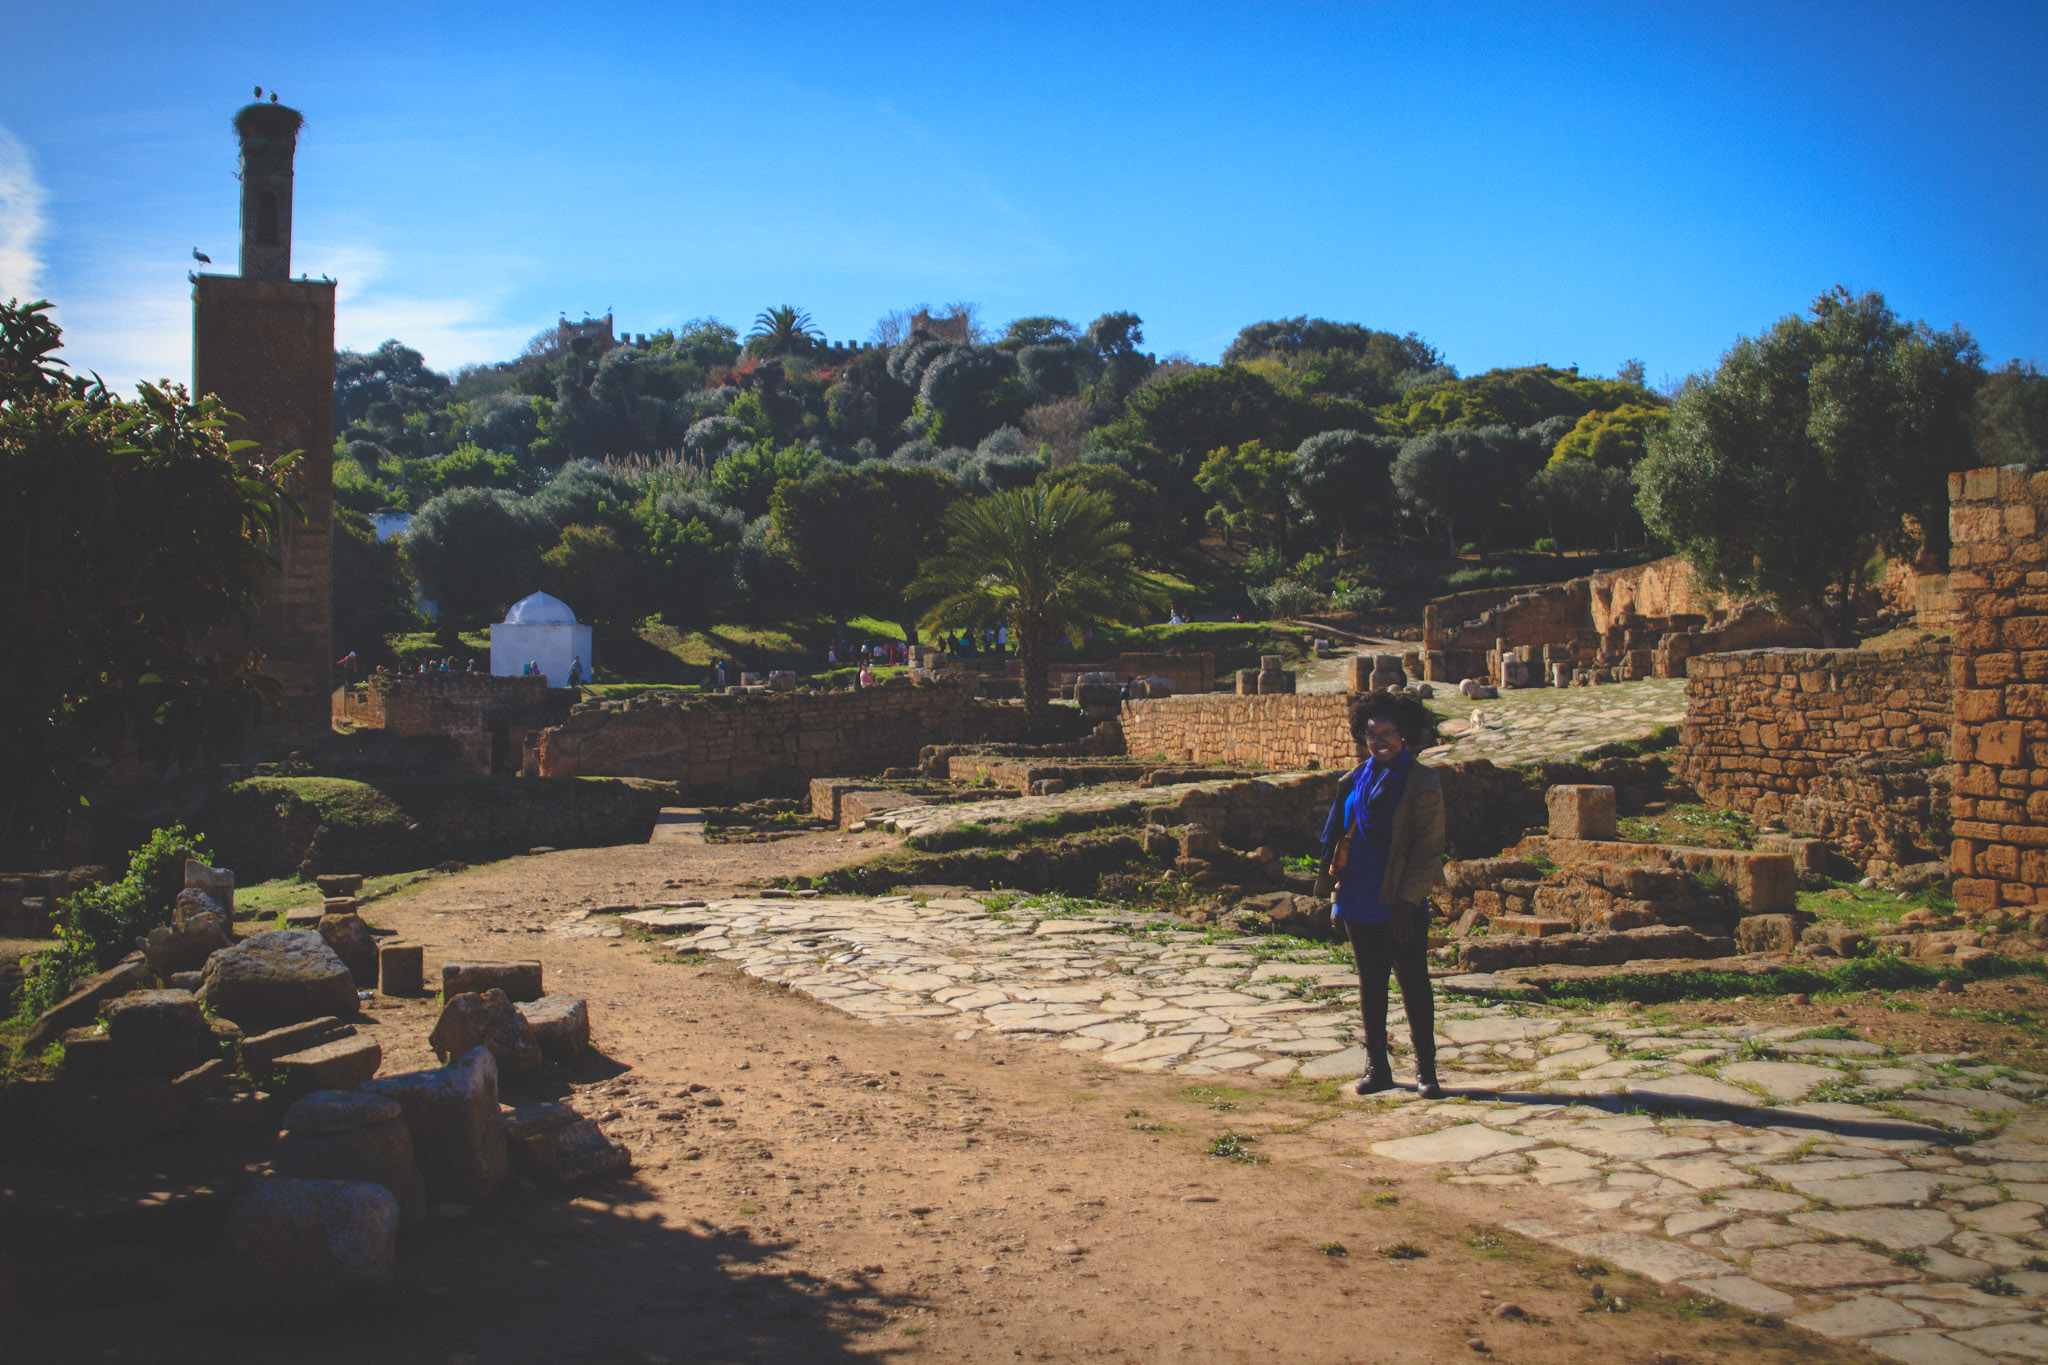 morocco_rabat_fez_casablanca_lesleyade_photography-31.jpg